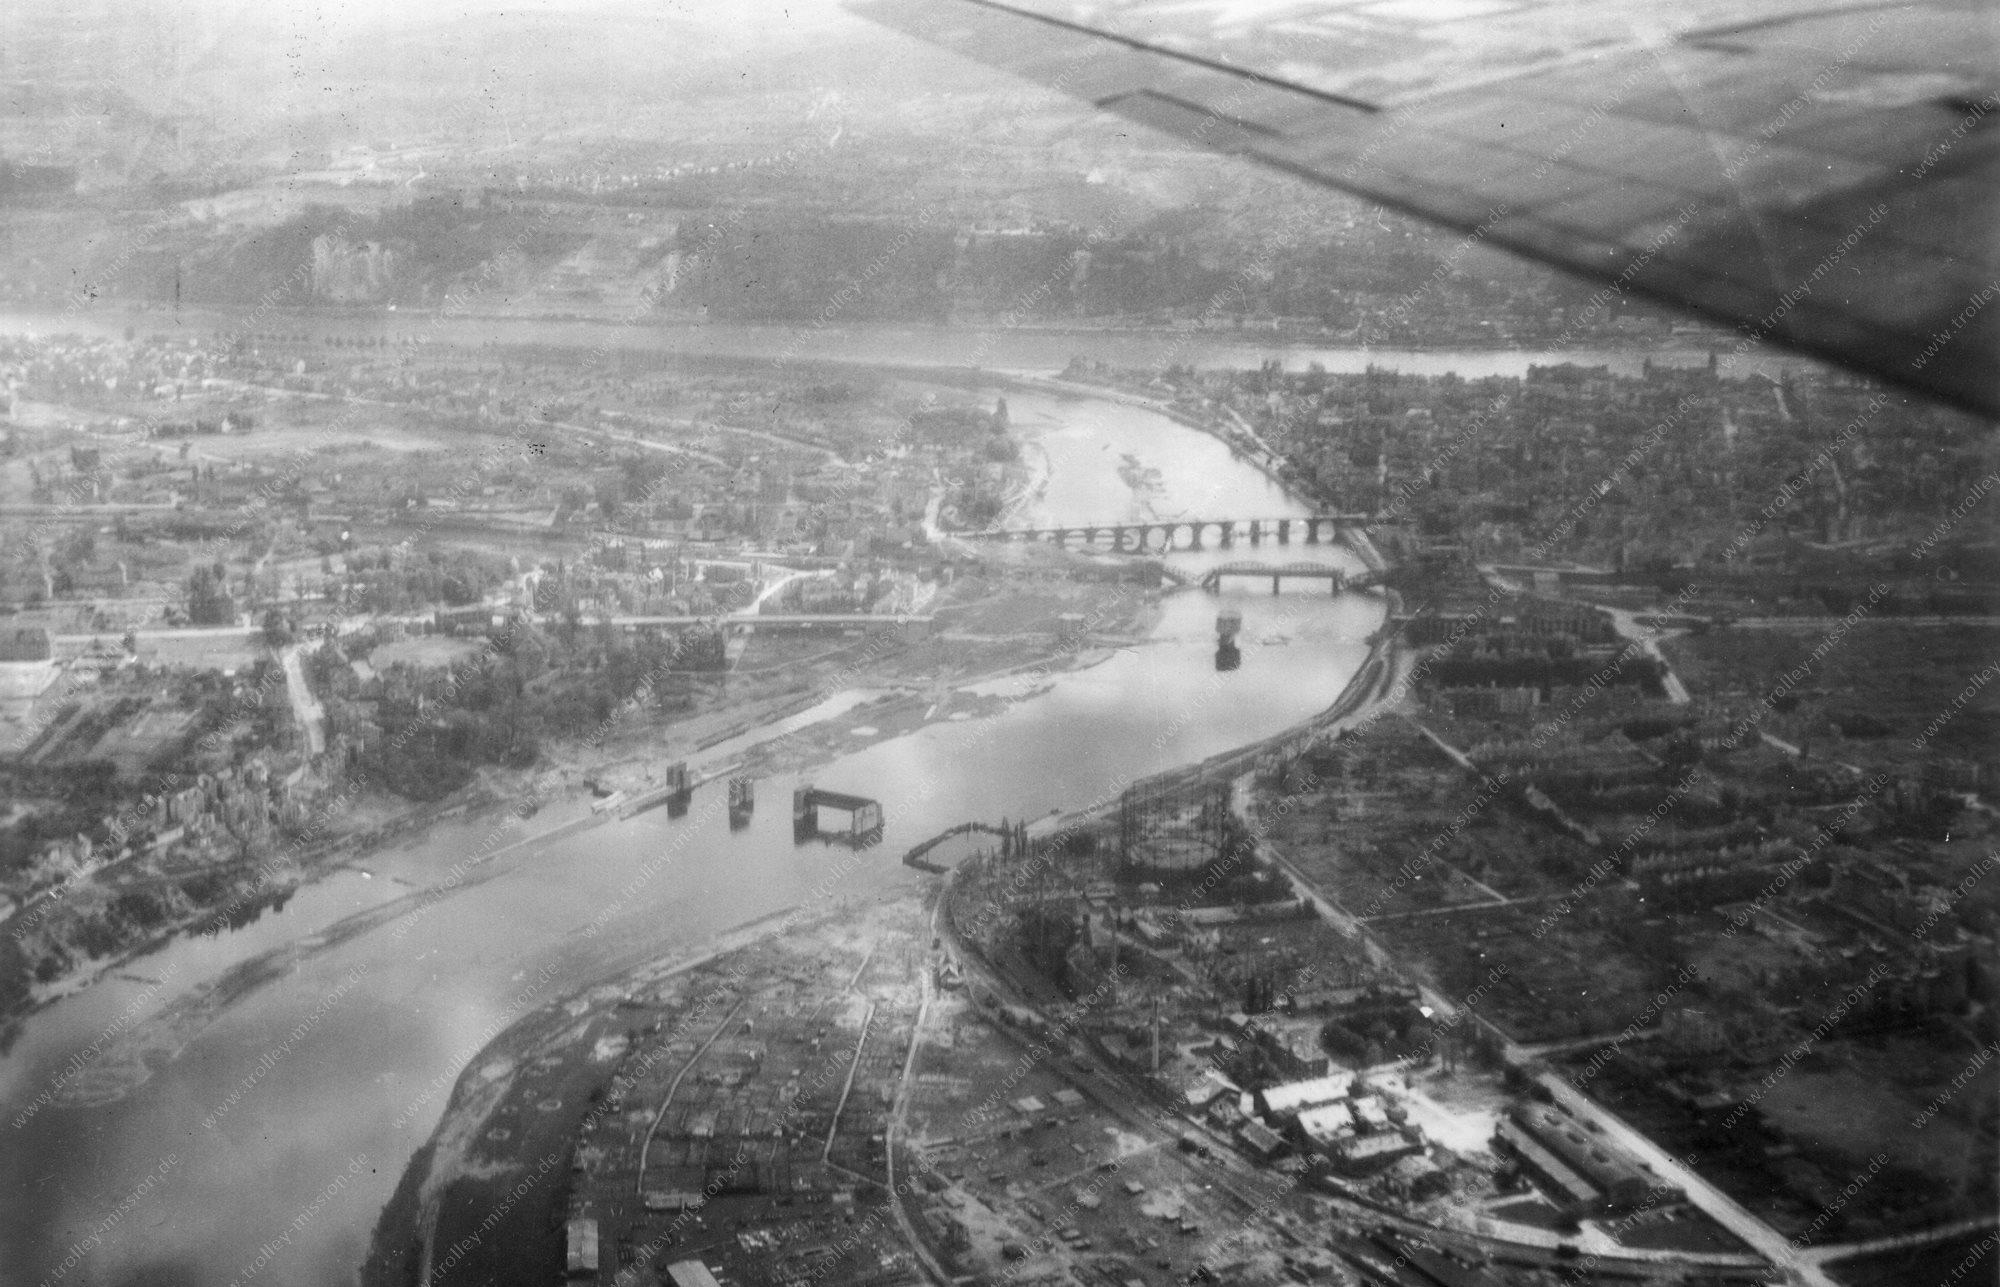 Luftbild Moseleisenbahnbrücke und Balduinbrücke in Koblenz